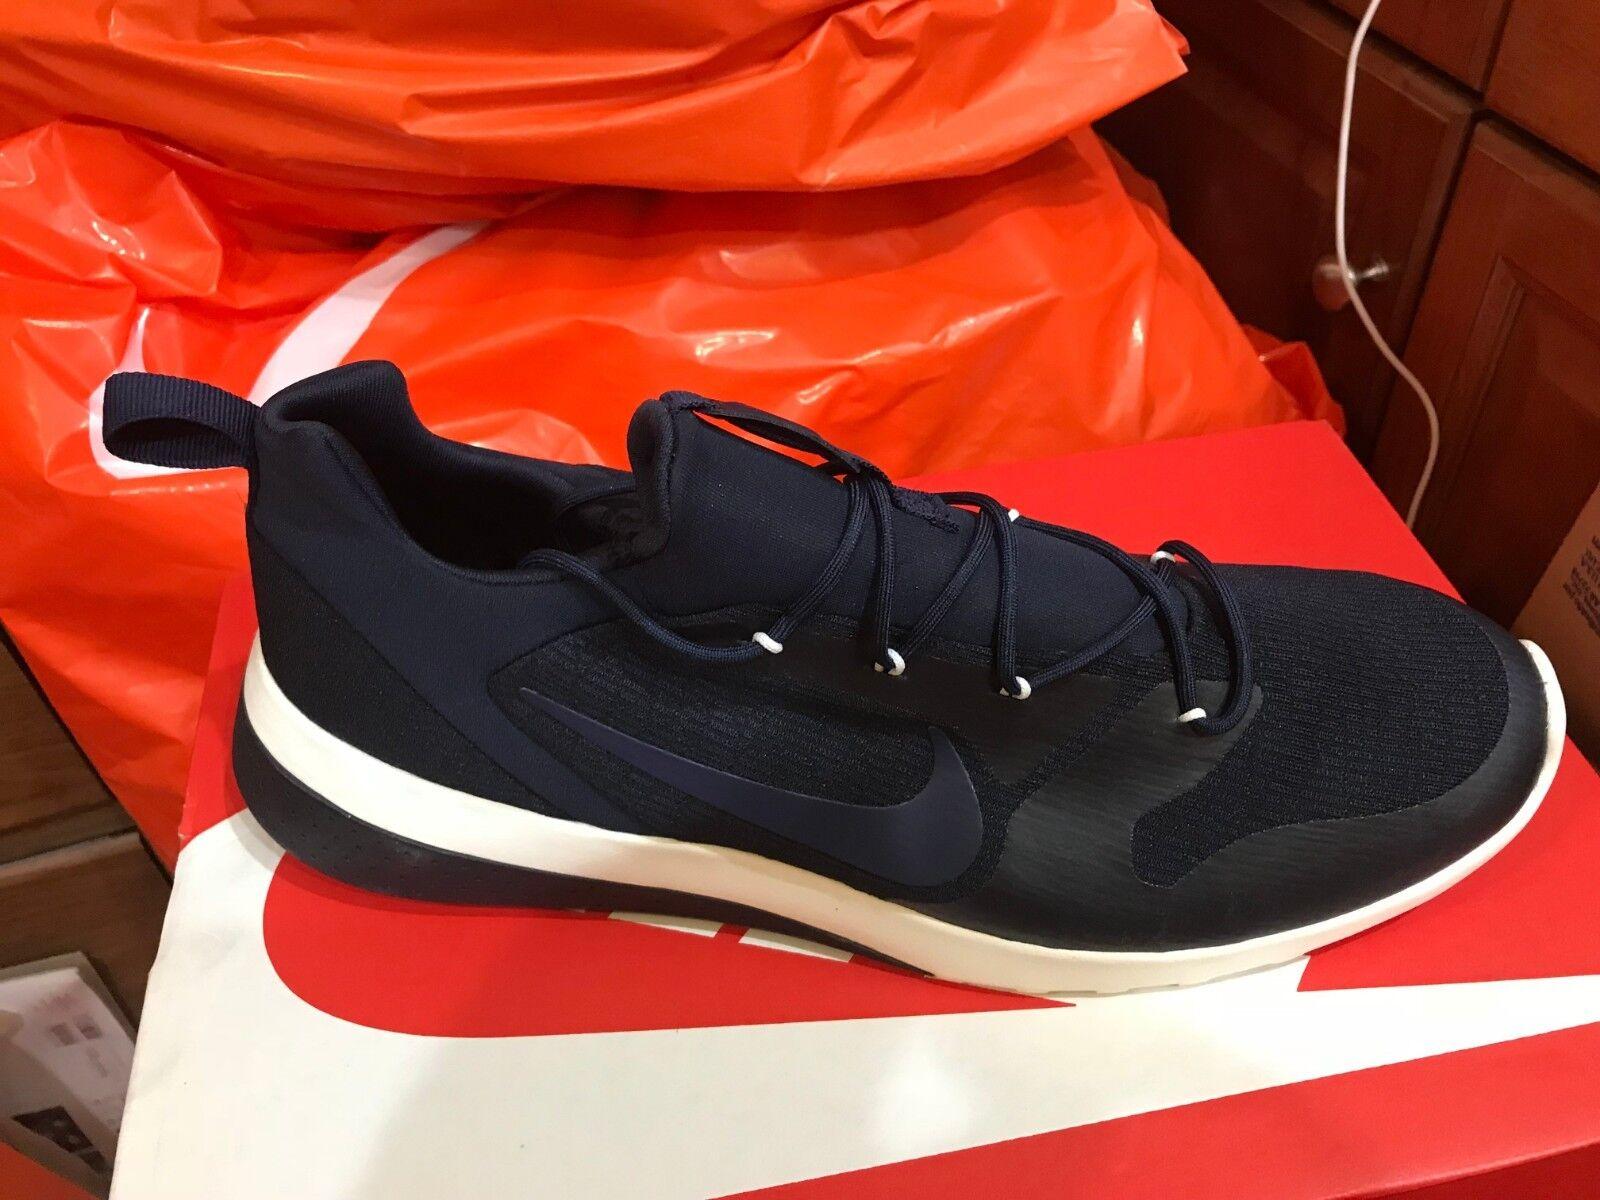 Nike CK Racer SZ 12 Obsidian Black Sail 916780 402 Lifestyle Running Men's Sizes